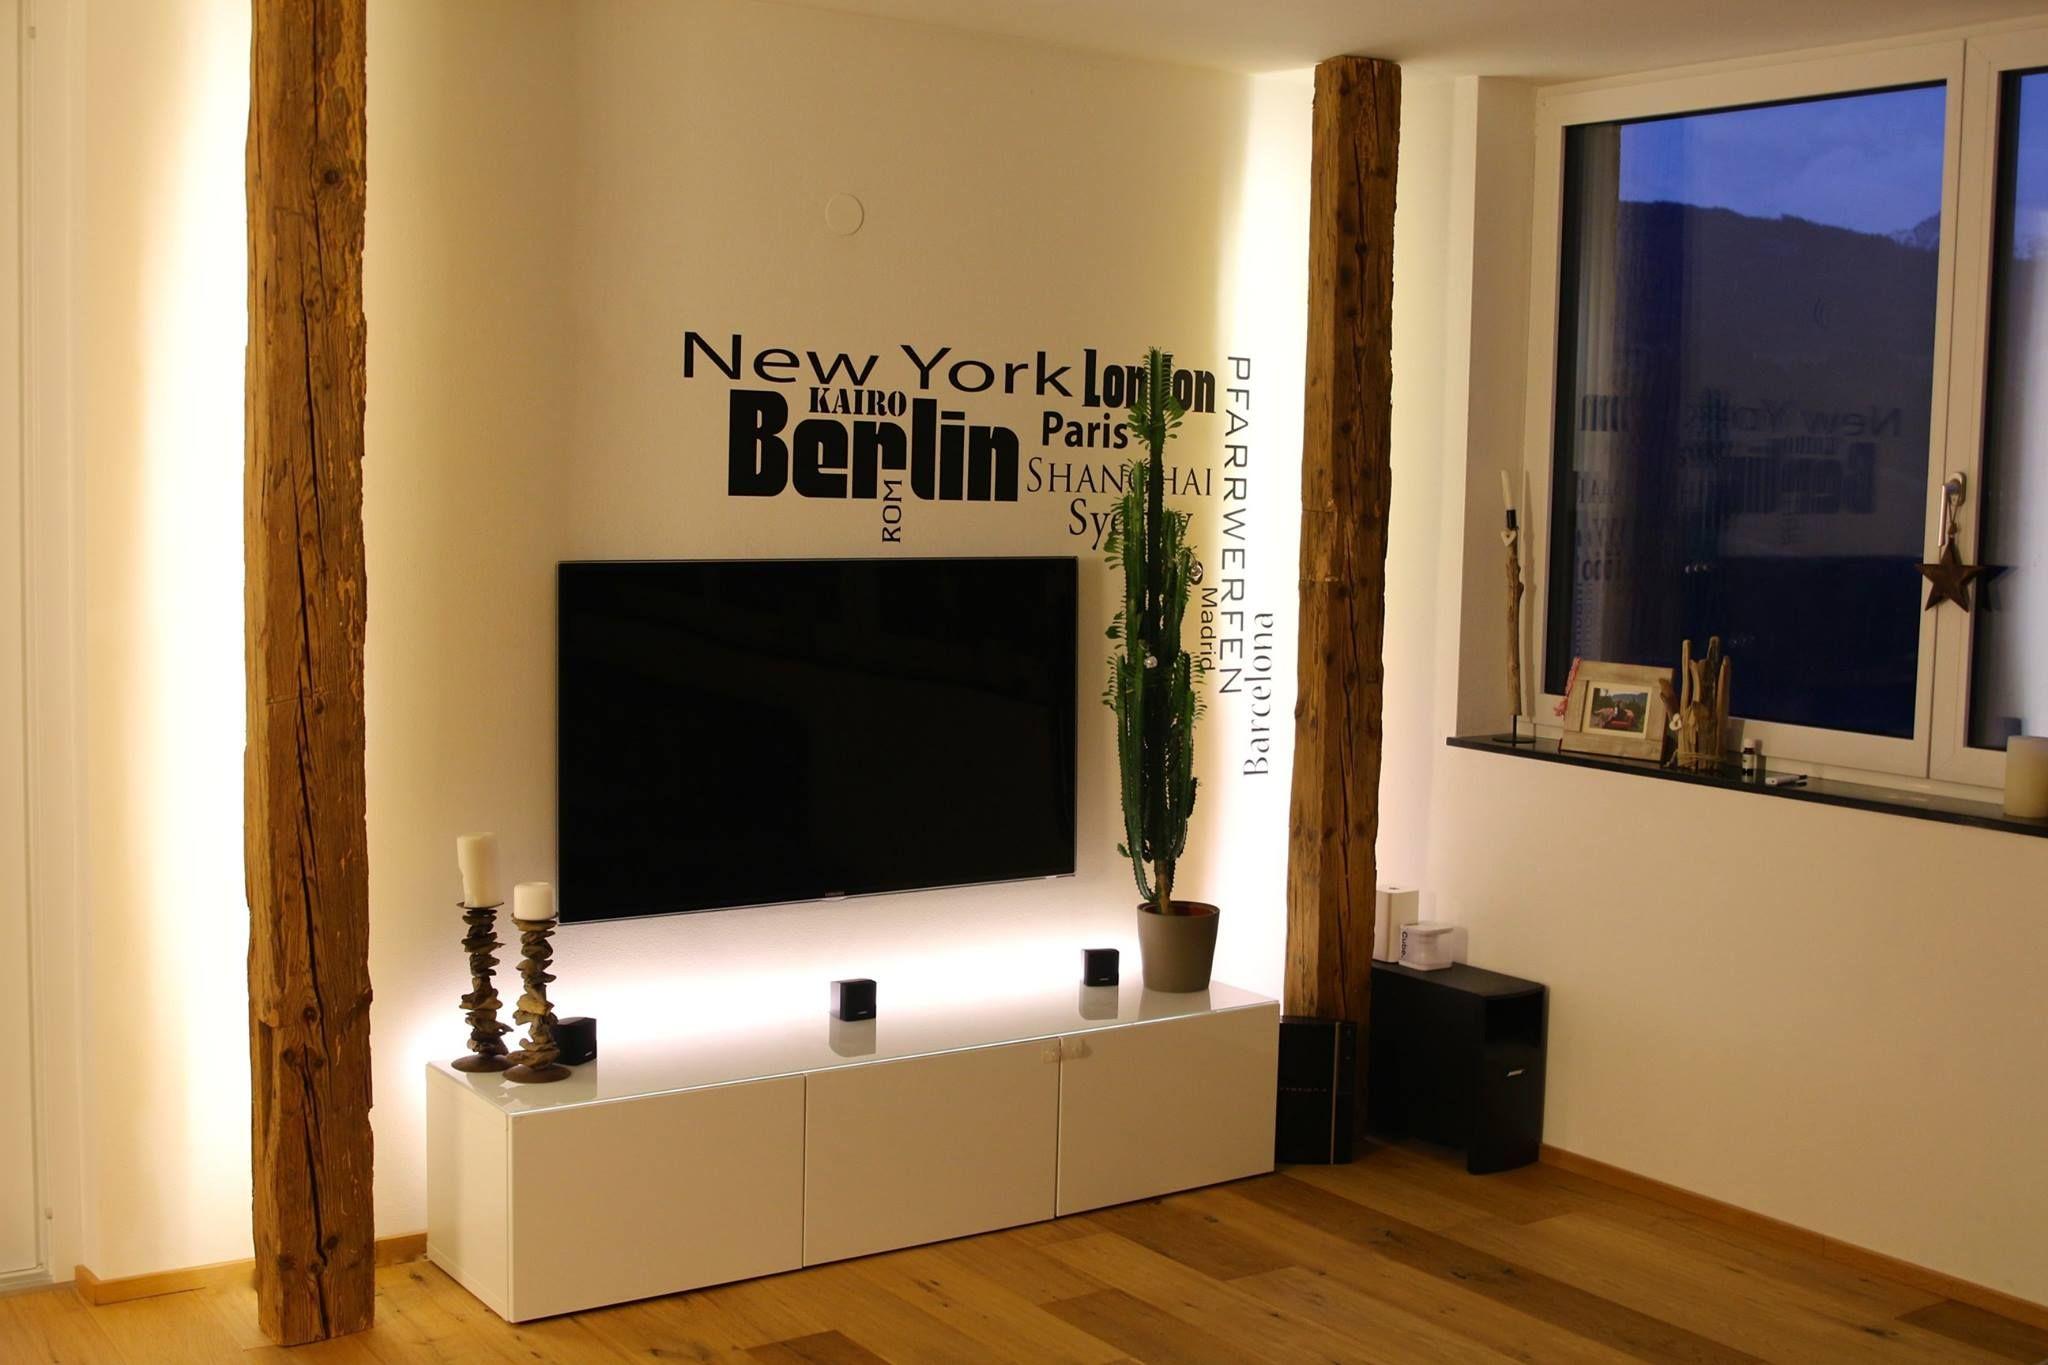 altholz balken wandgestaltung - Wohnzimmer Ideen Wandgestaltung Regal